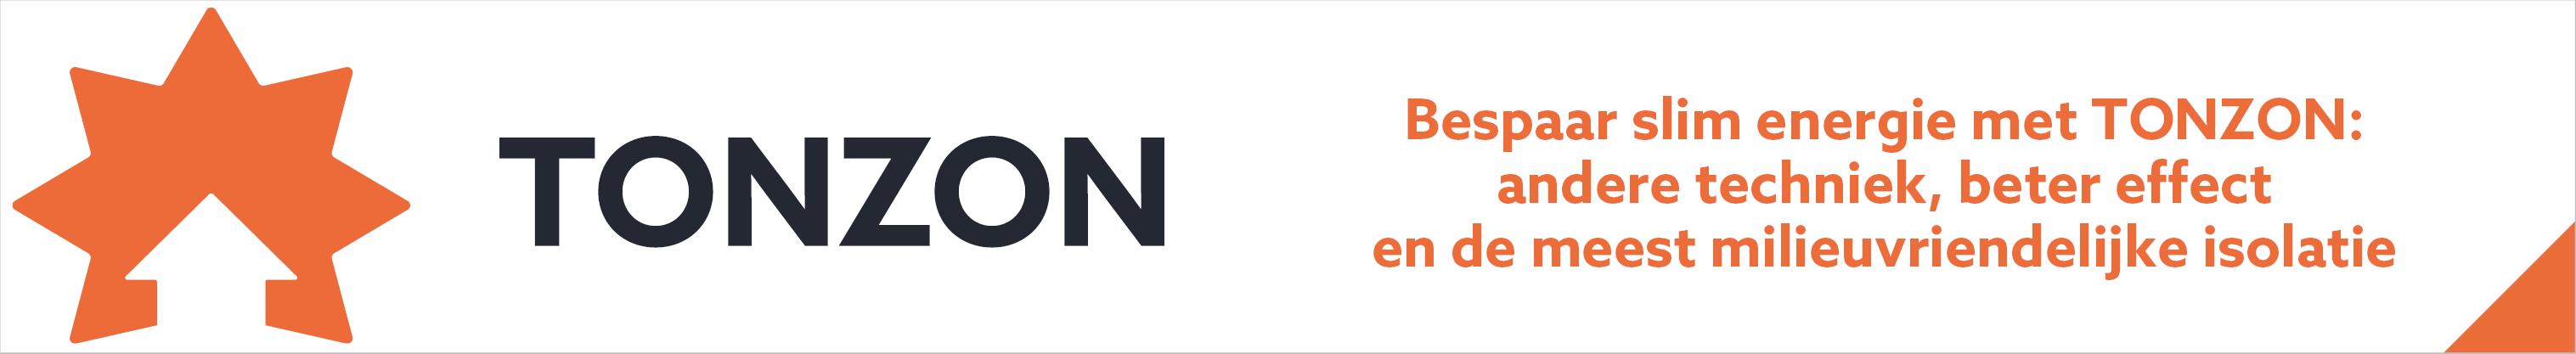 tonzon-banner-vloerisolatie